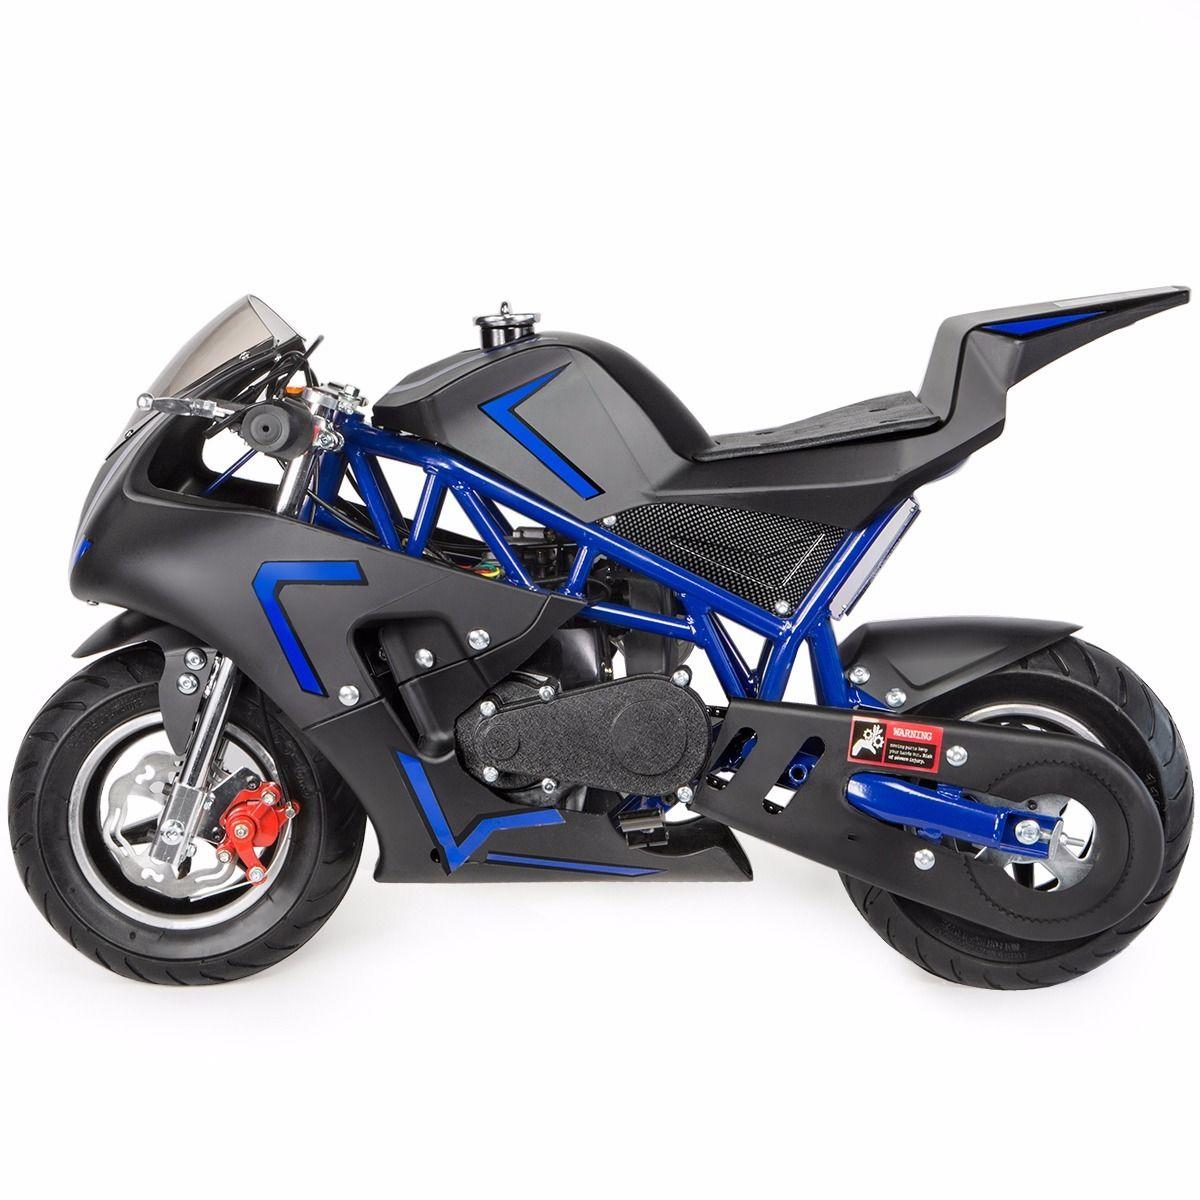 XtremepowerUS-Gas-Pocket-Bike-Motor-Bike-Scooter-40cc-Epa-Engine-Motorcycle thumbnail 8